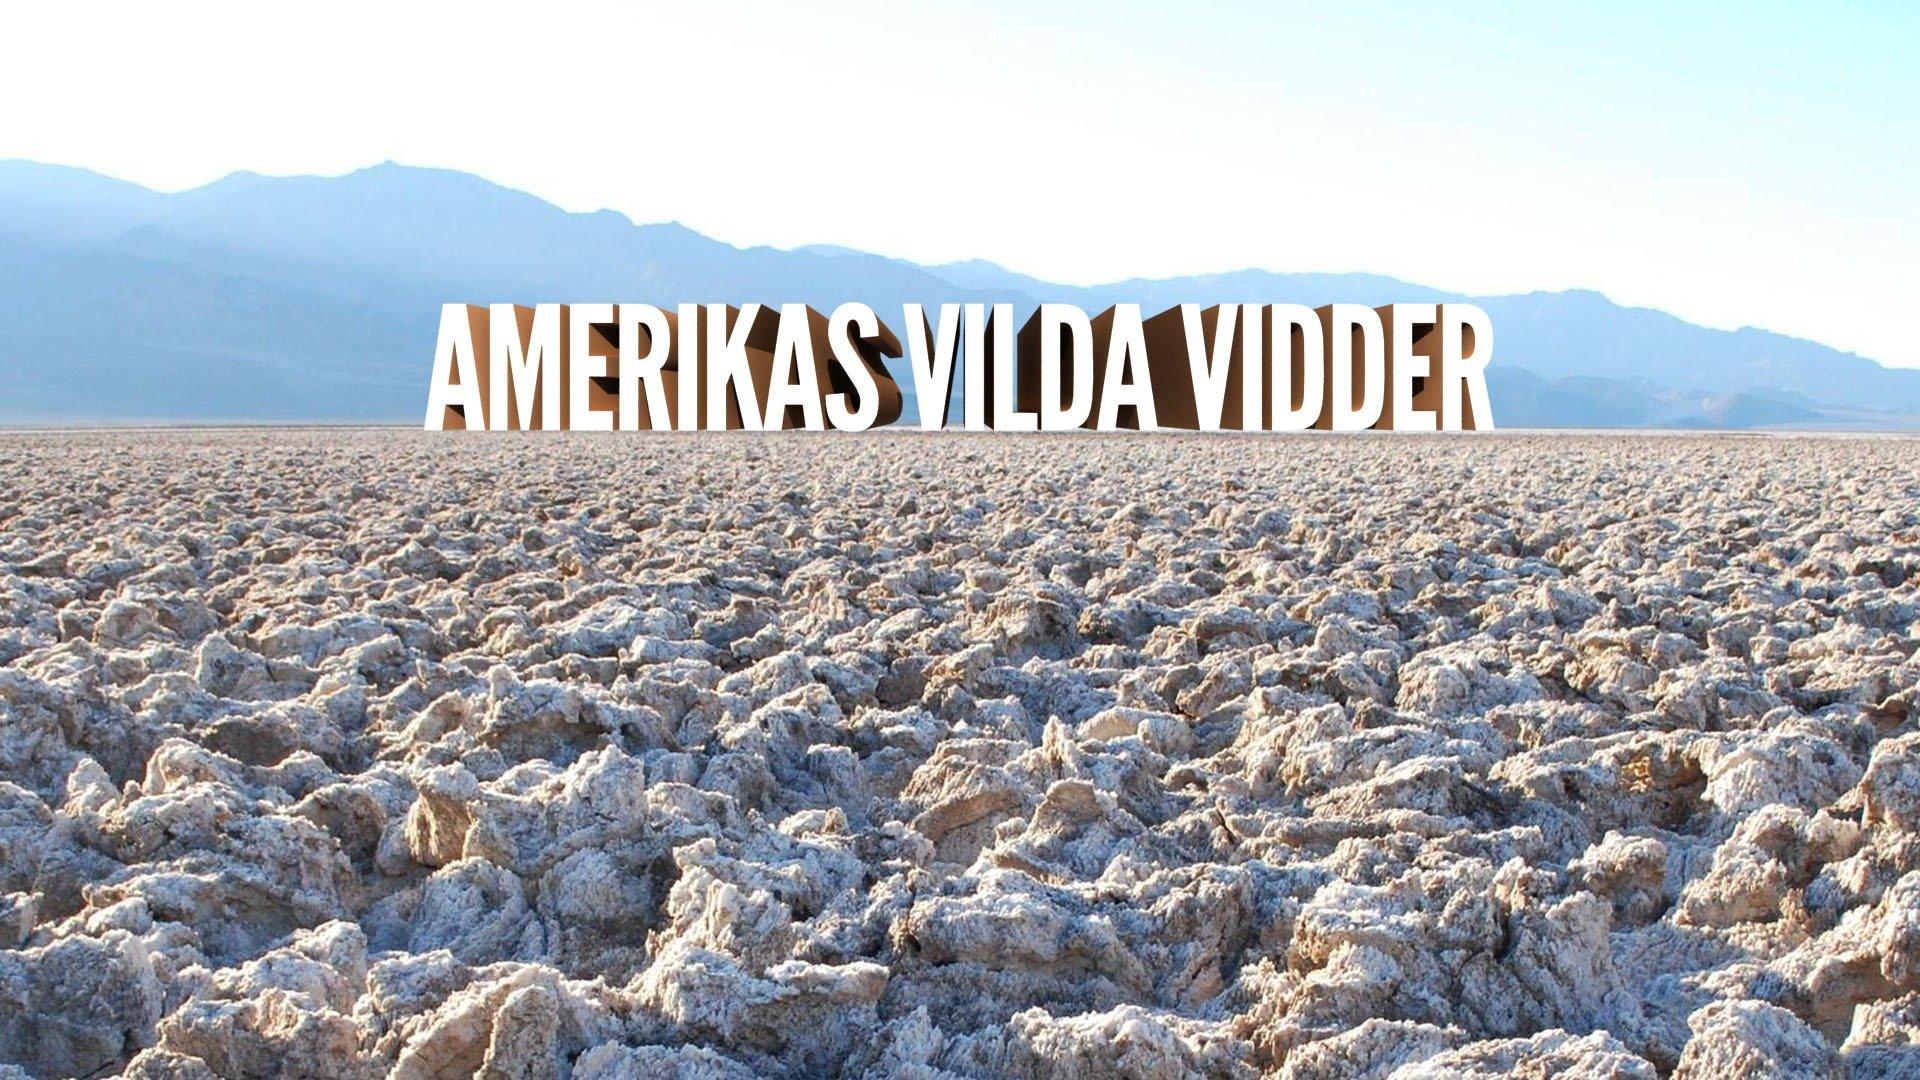 Amerikas vilda vidder